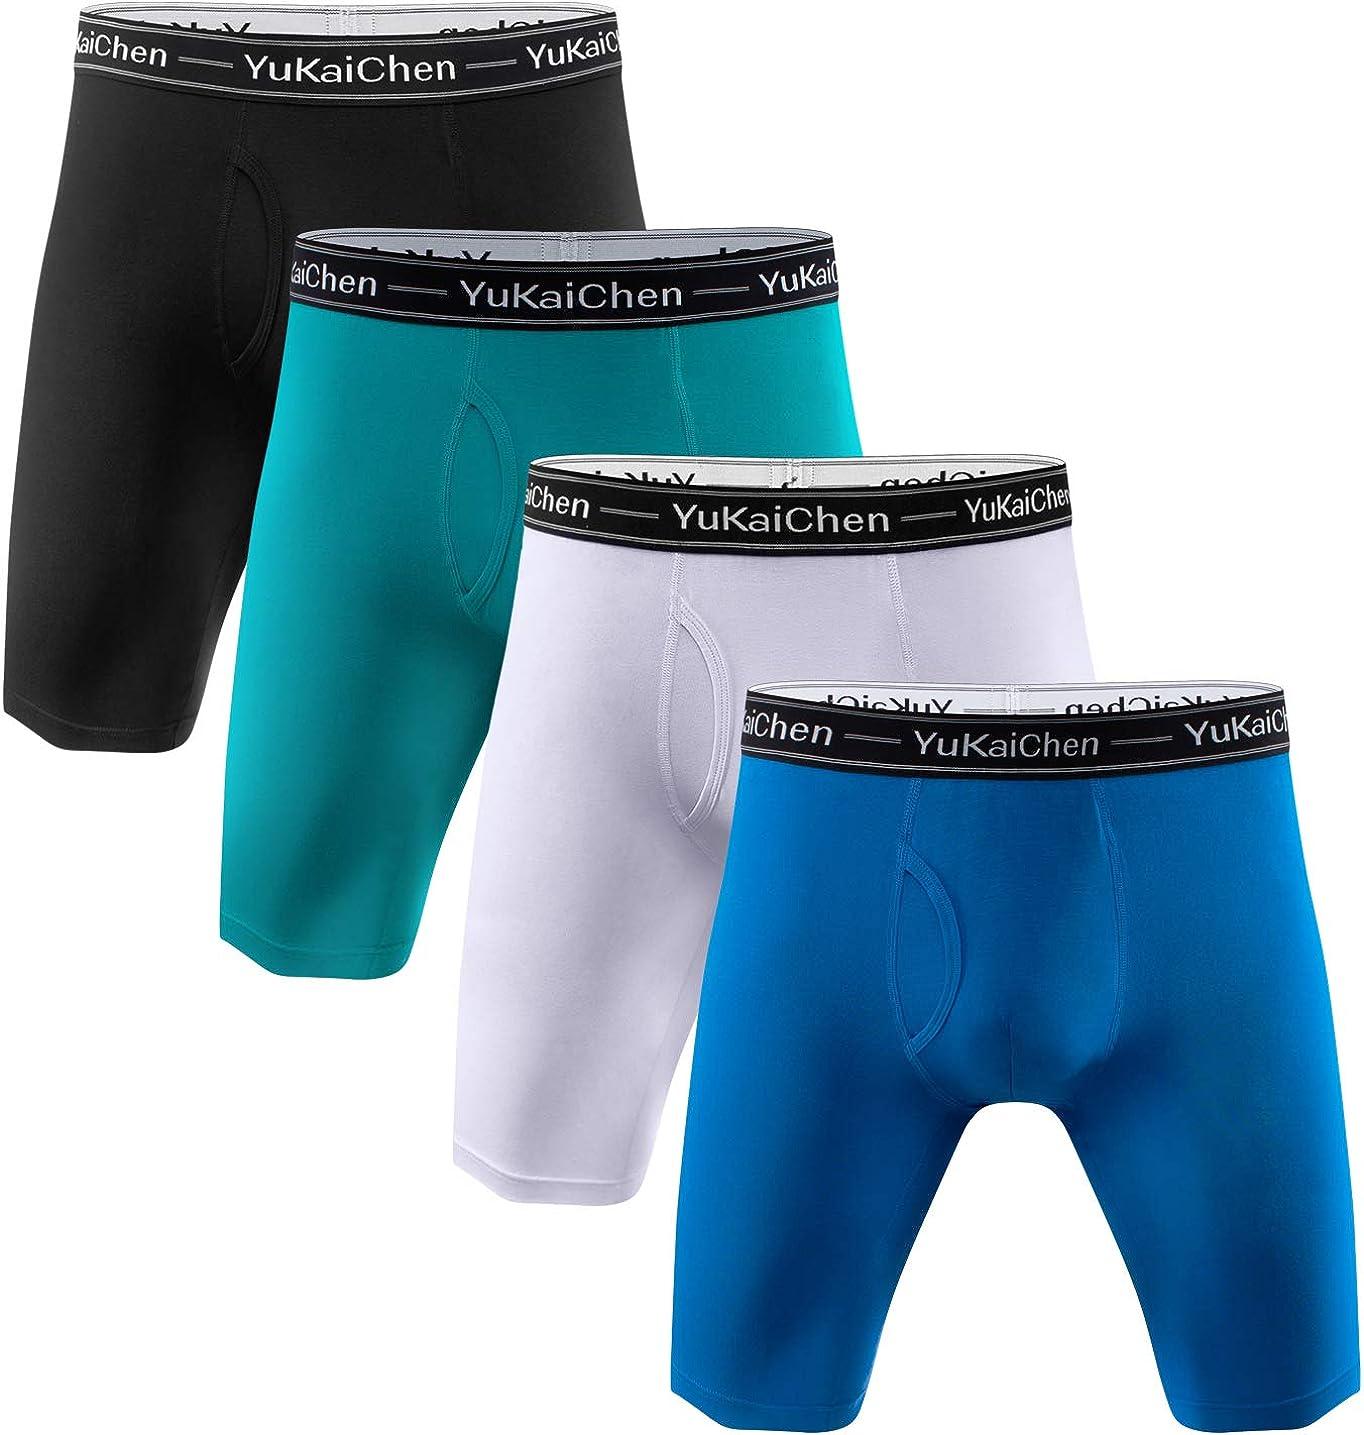 YuKaiChen Directly managed store Men's Soft Bamboo Fiber Long Briefs Boxer Fu 2021 new Underwear